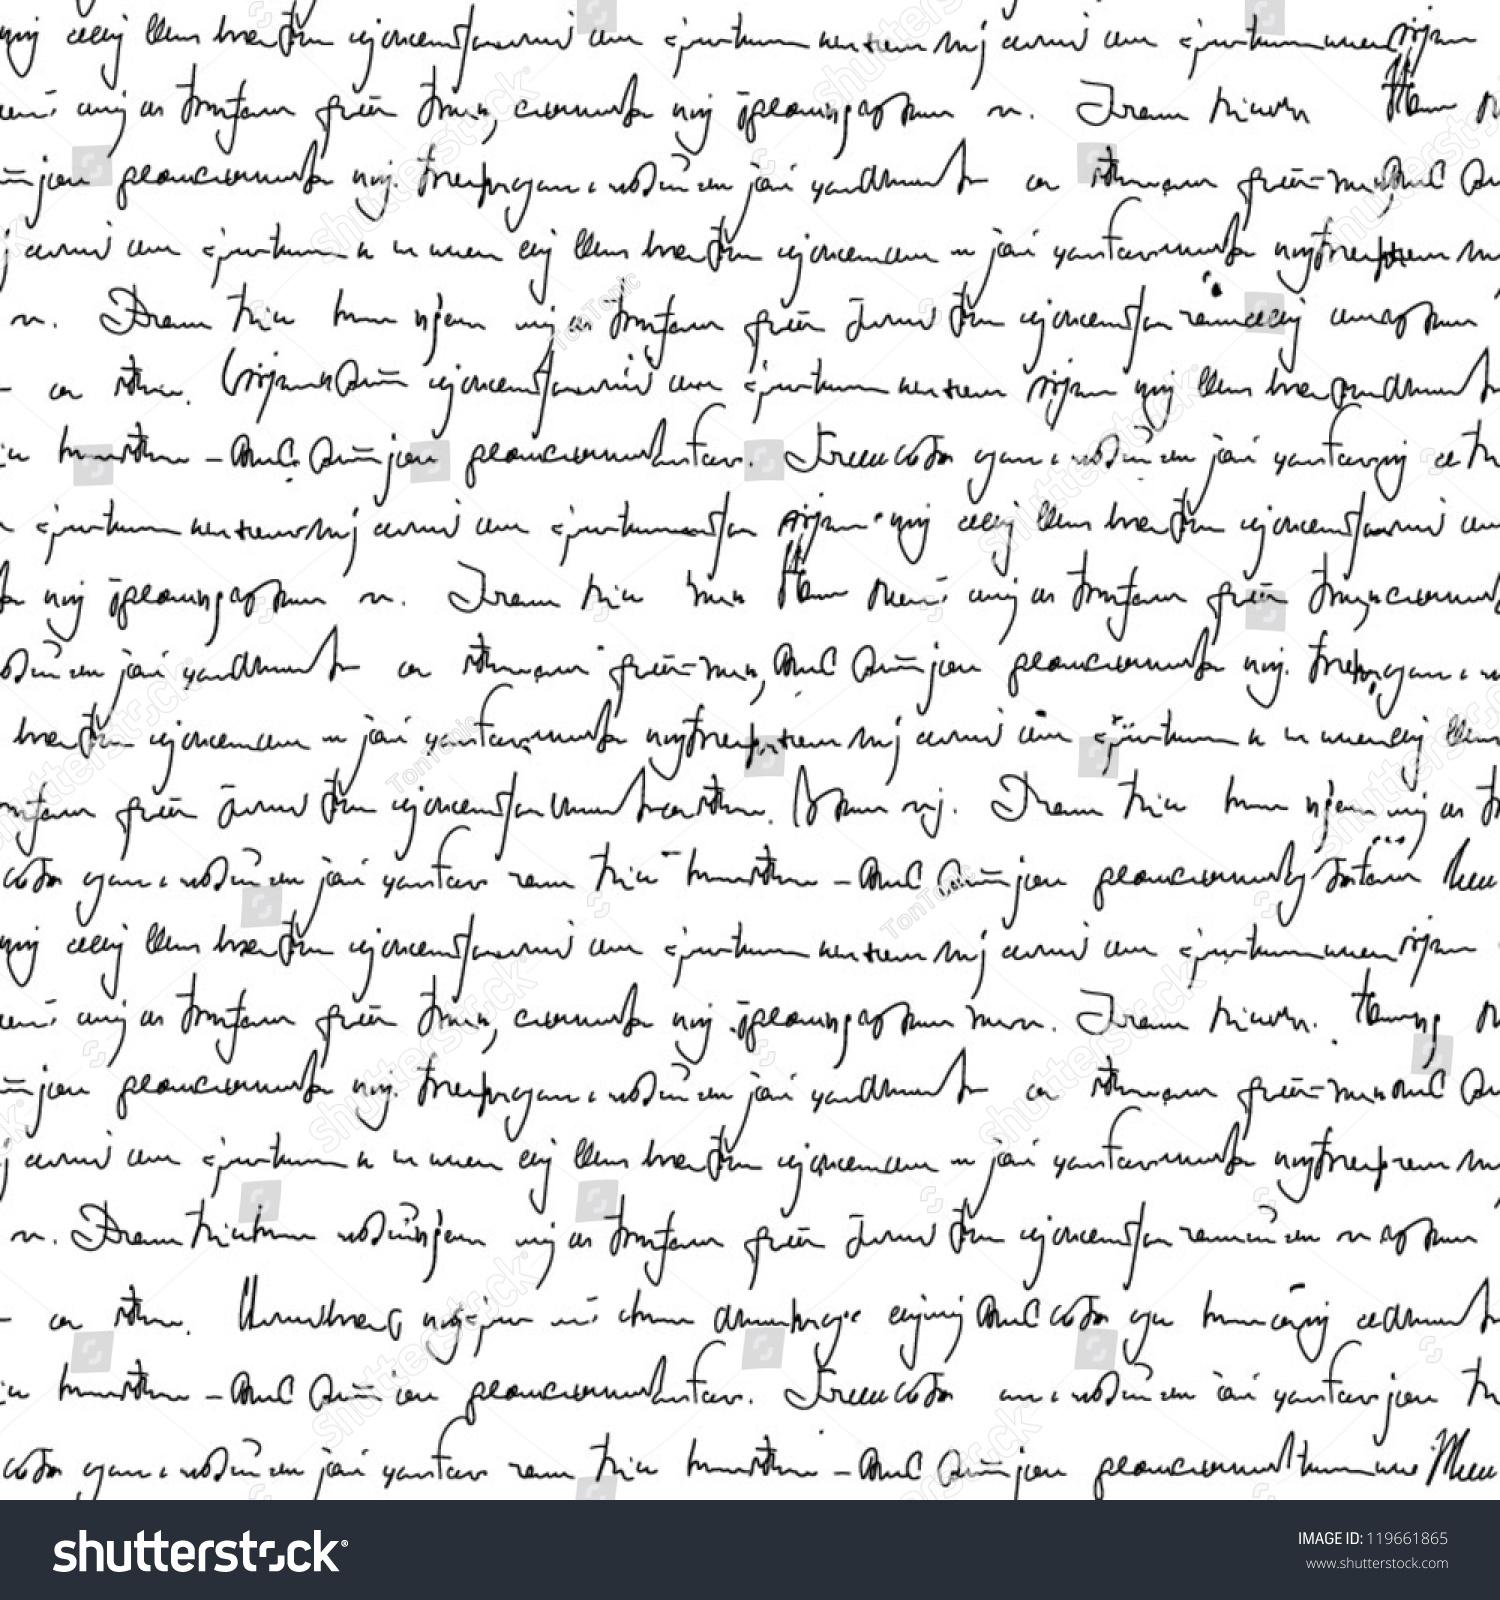 Unreadable handwriting